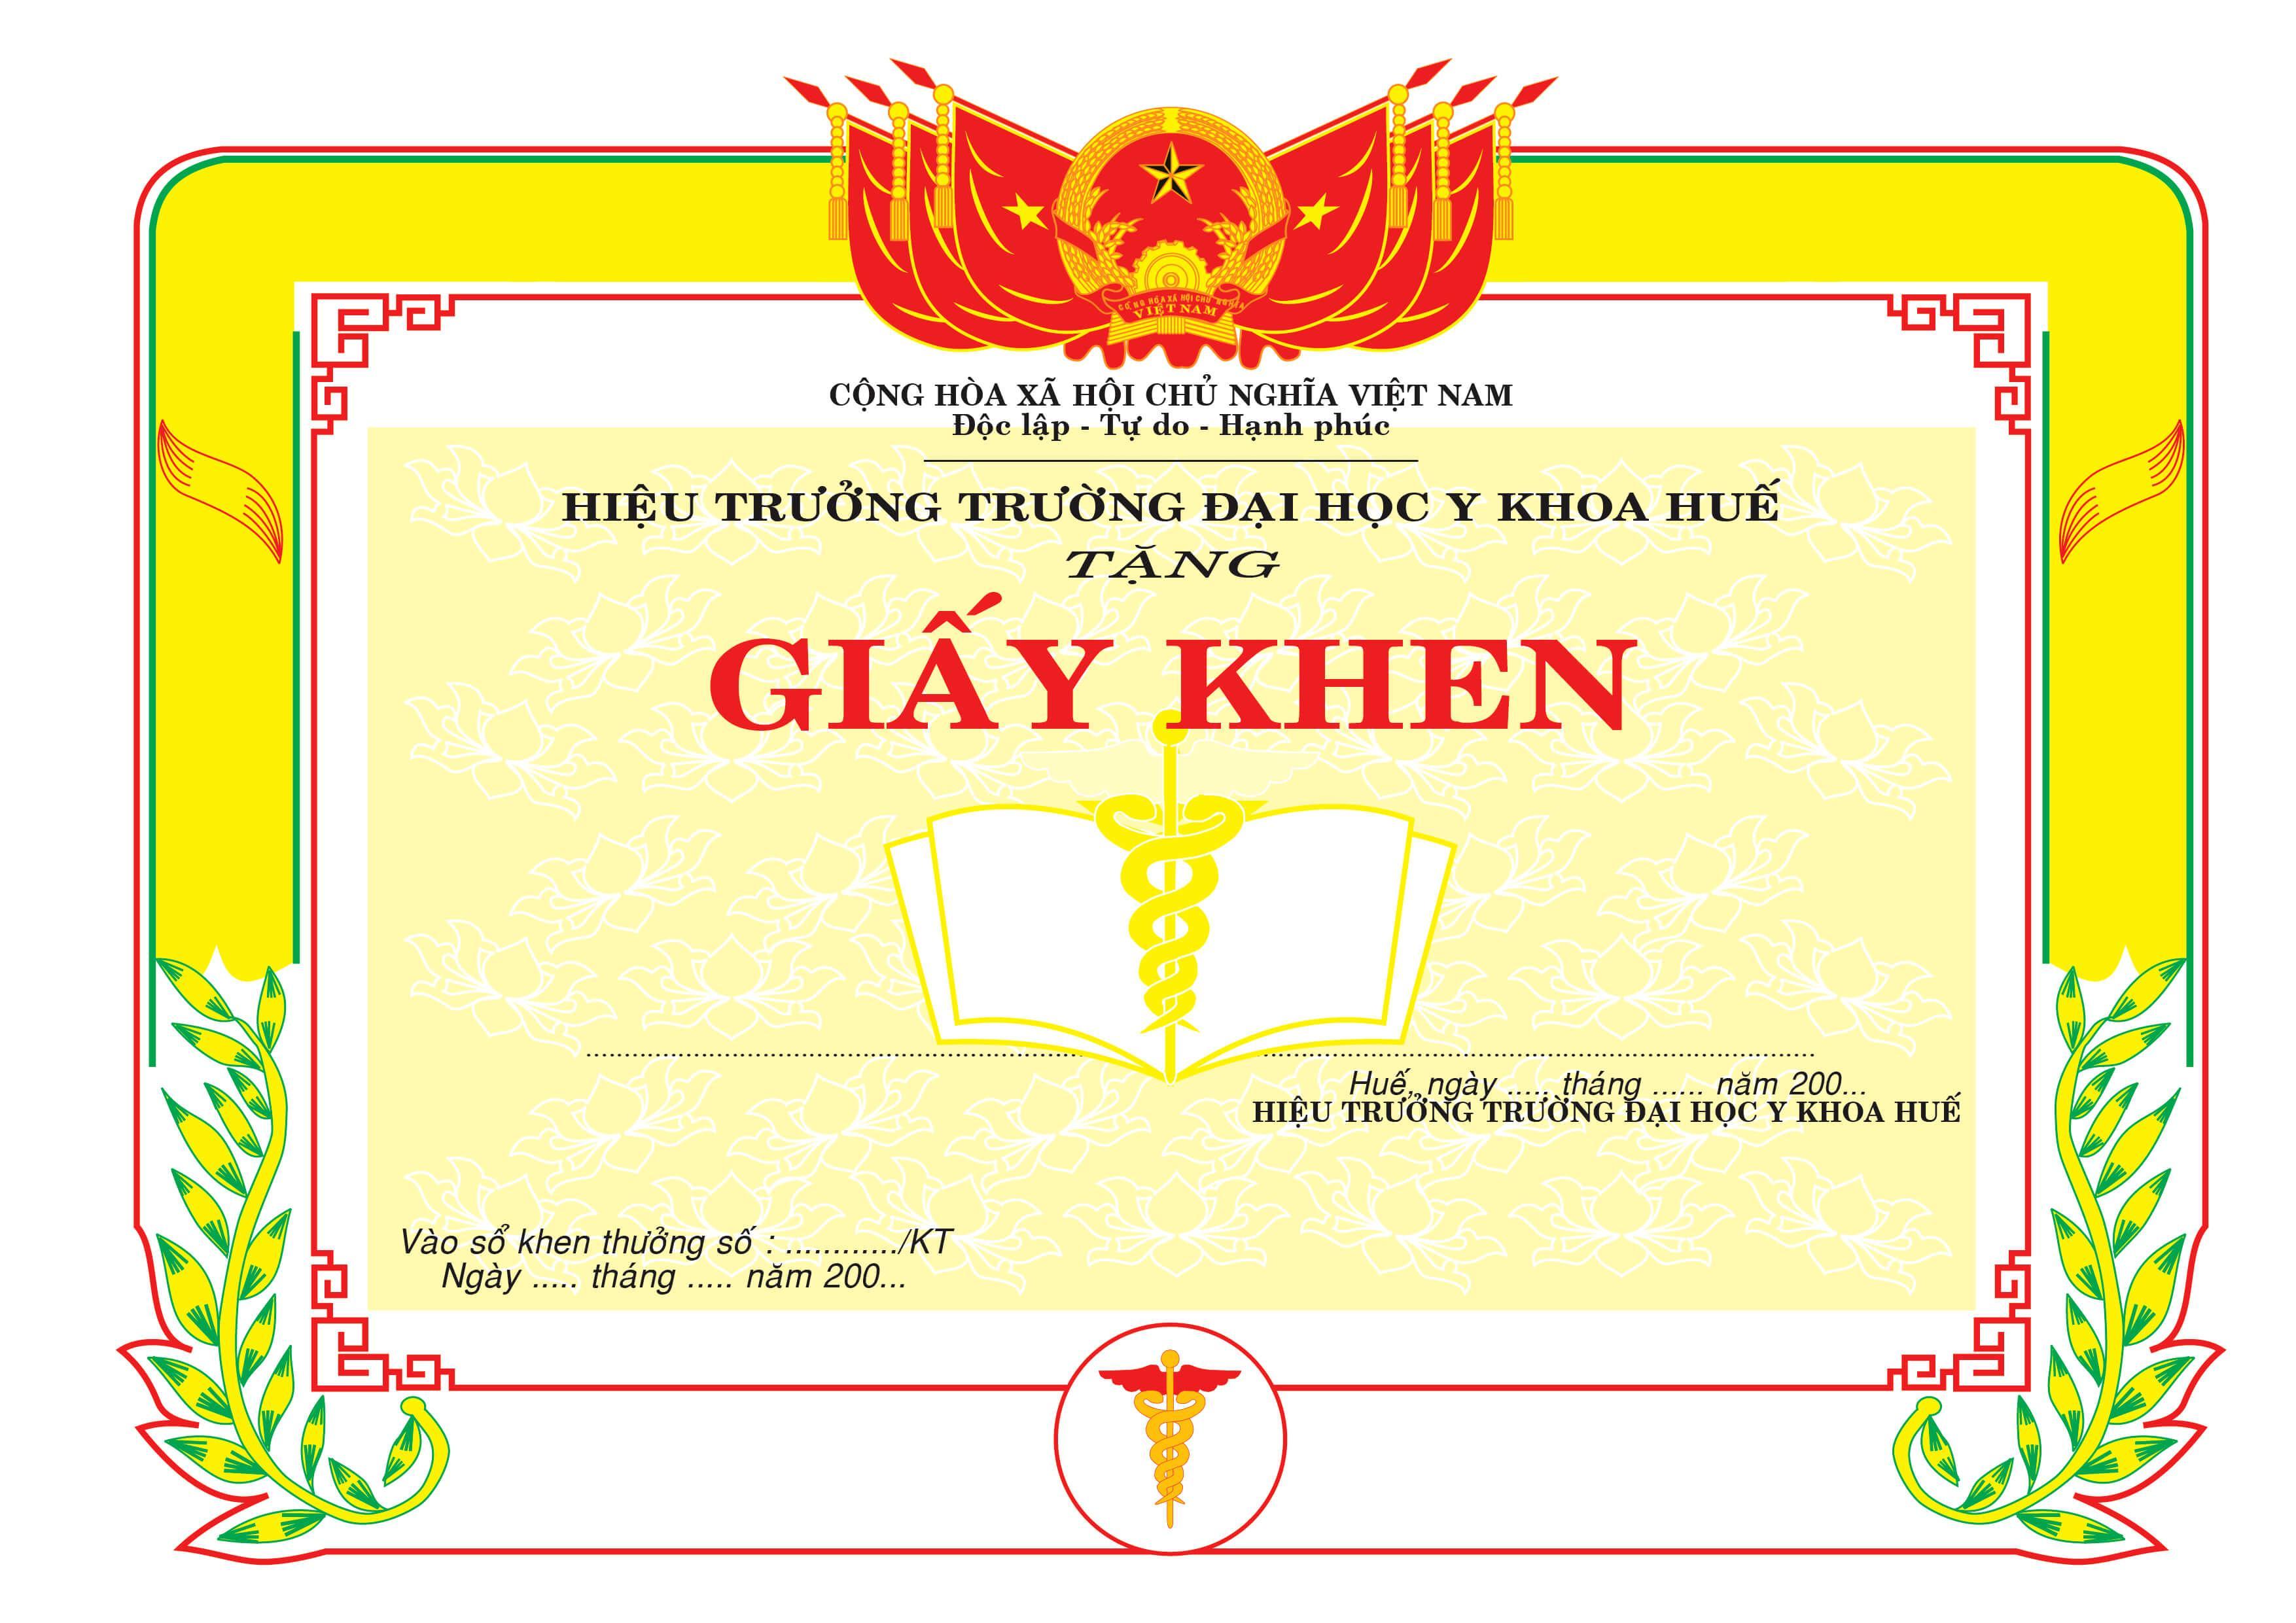 Mẫu giấy khen 061 - Mẫu giấy khen trường đại học - link download : https://adsnew.net/gRBBb4y0